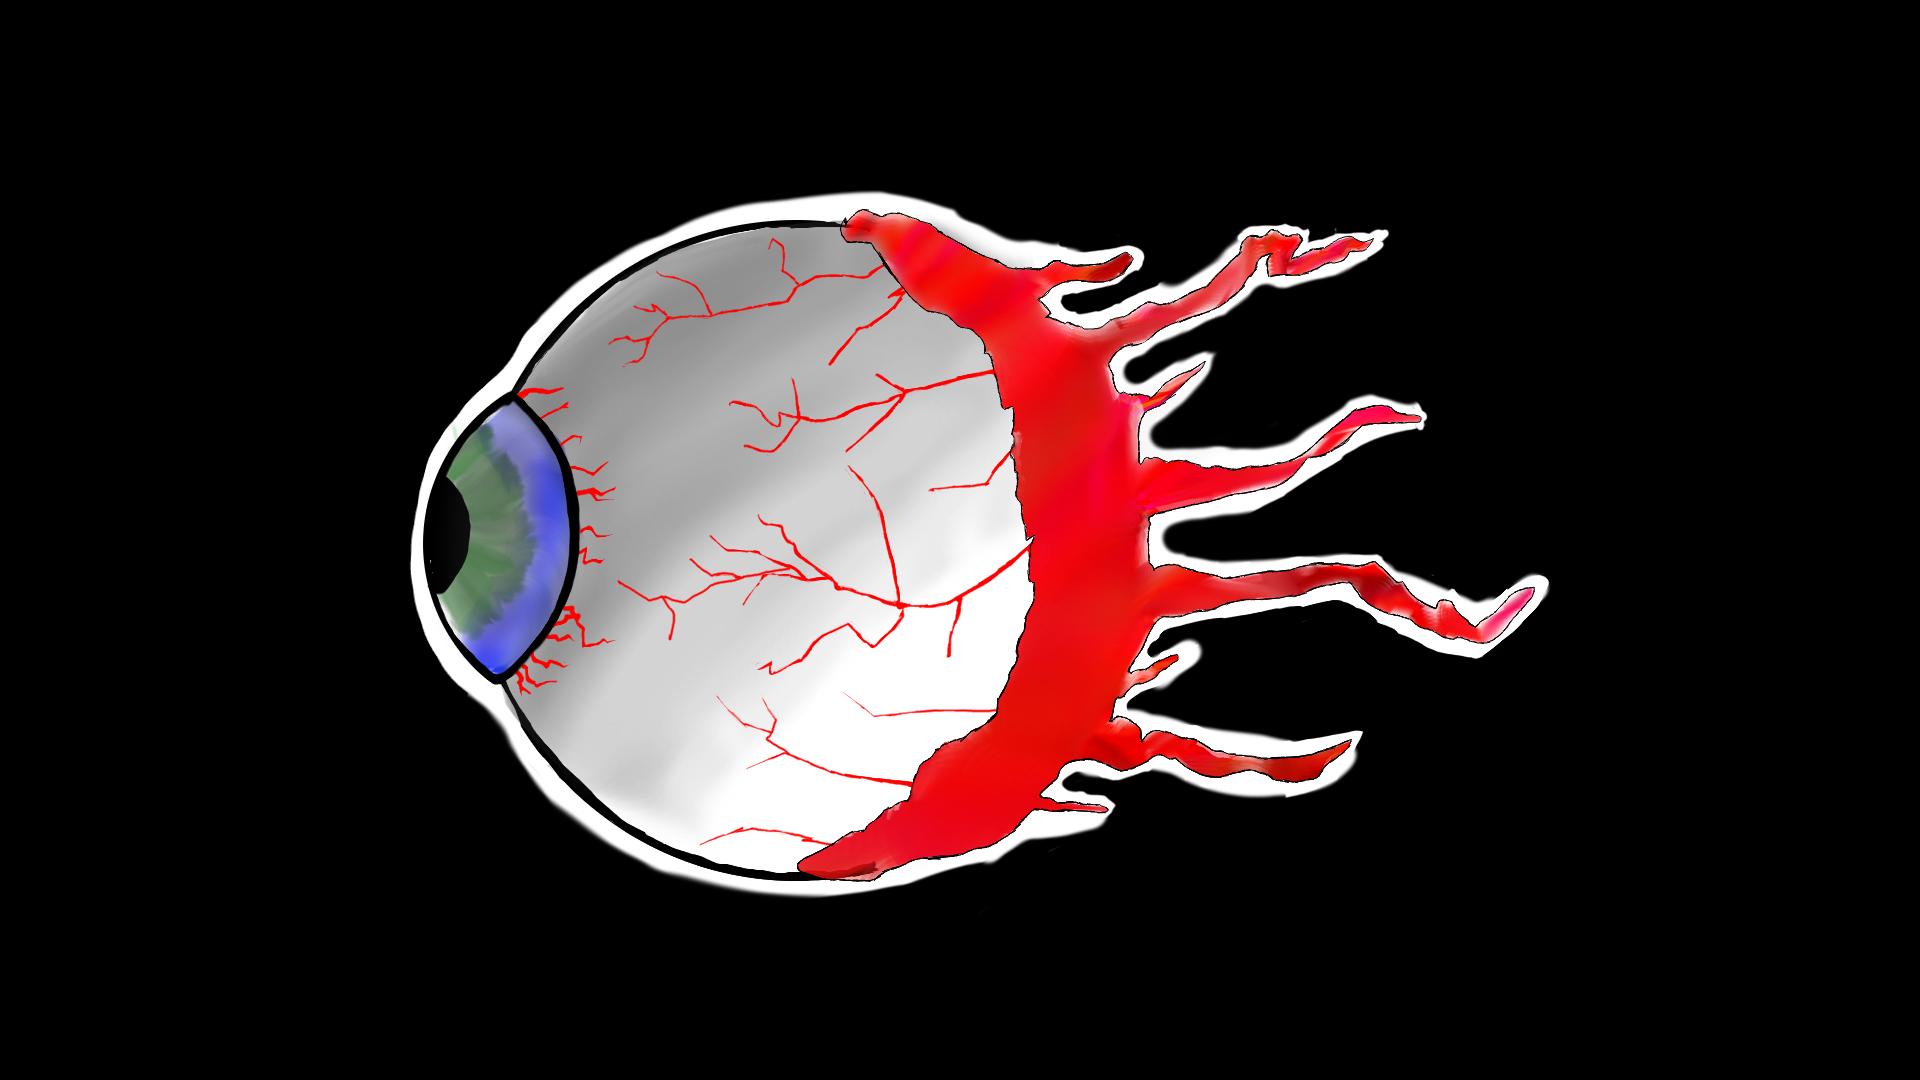 Eye Of Chtutlu Terraria Fan Art v1.0